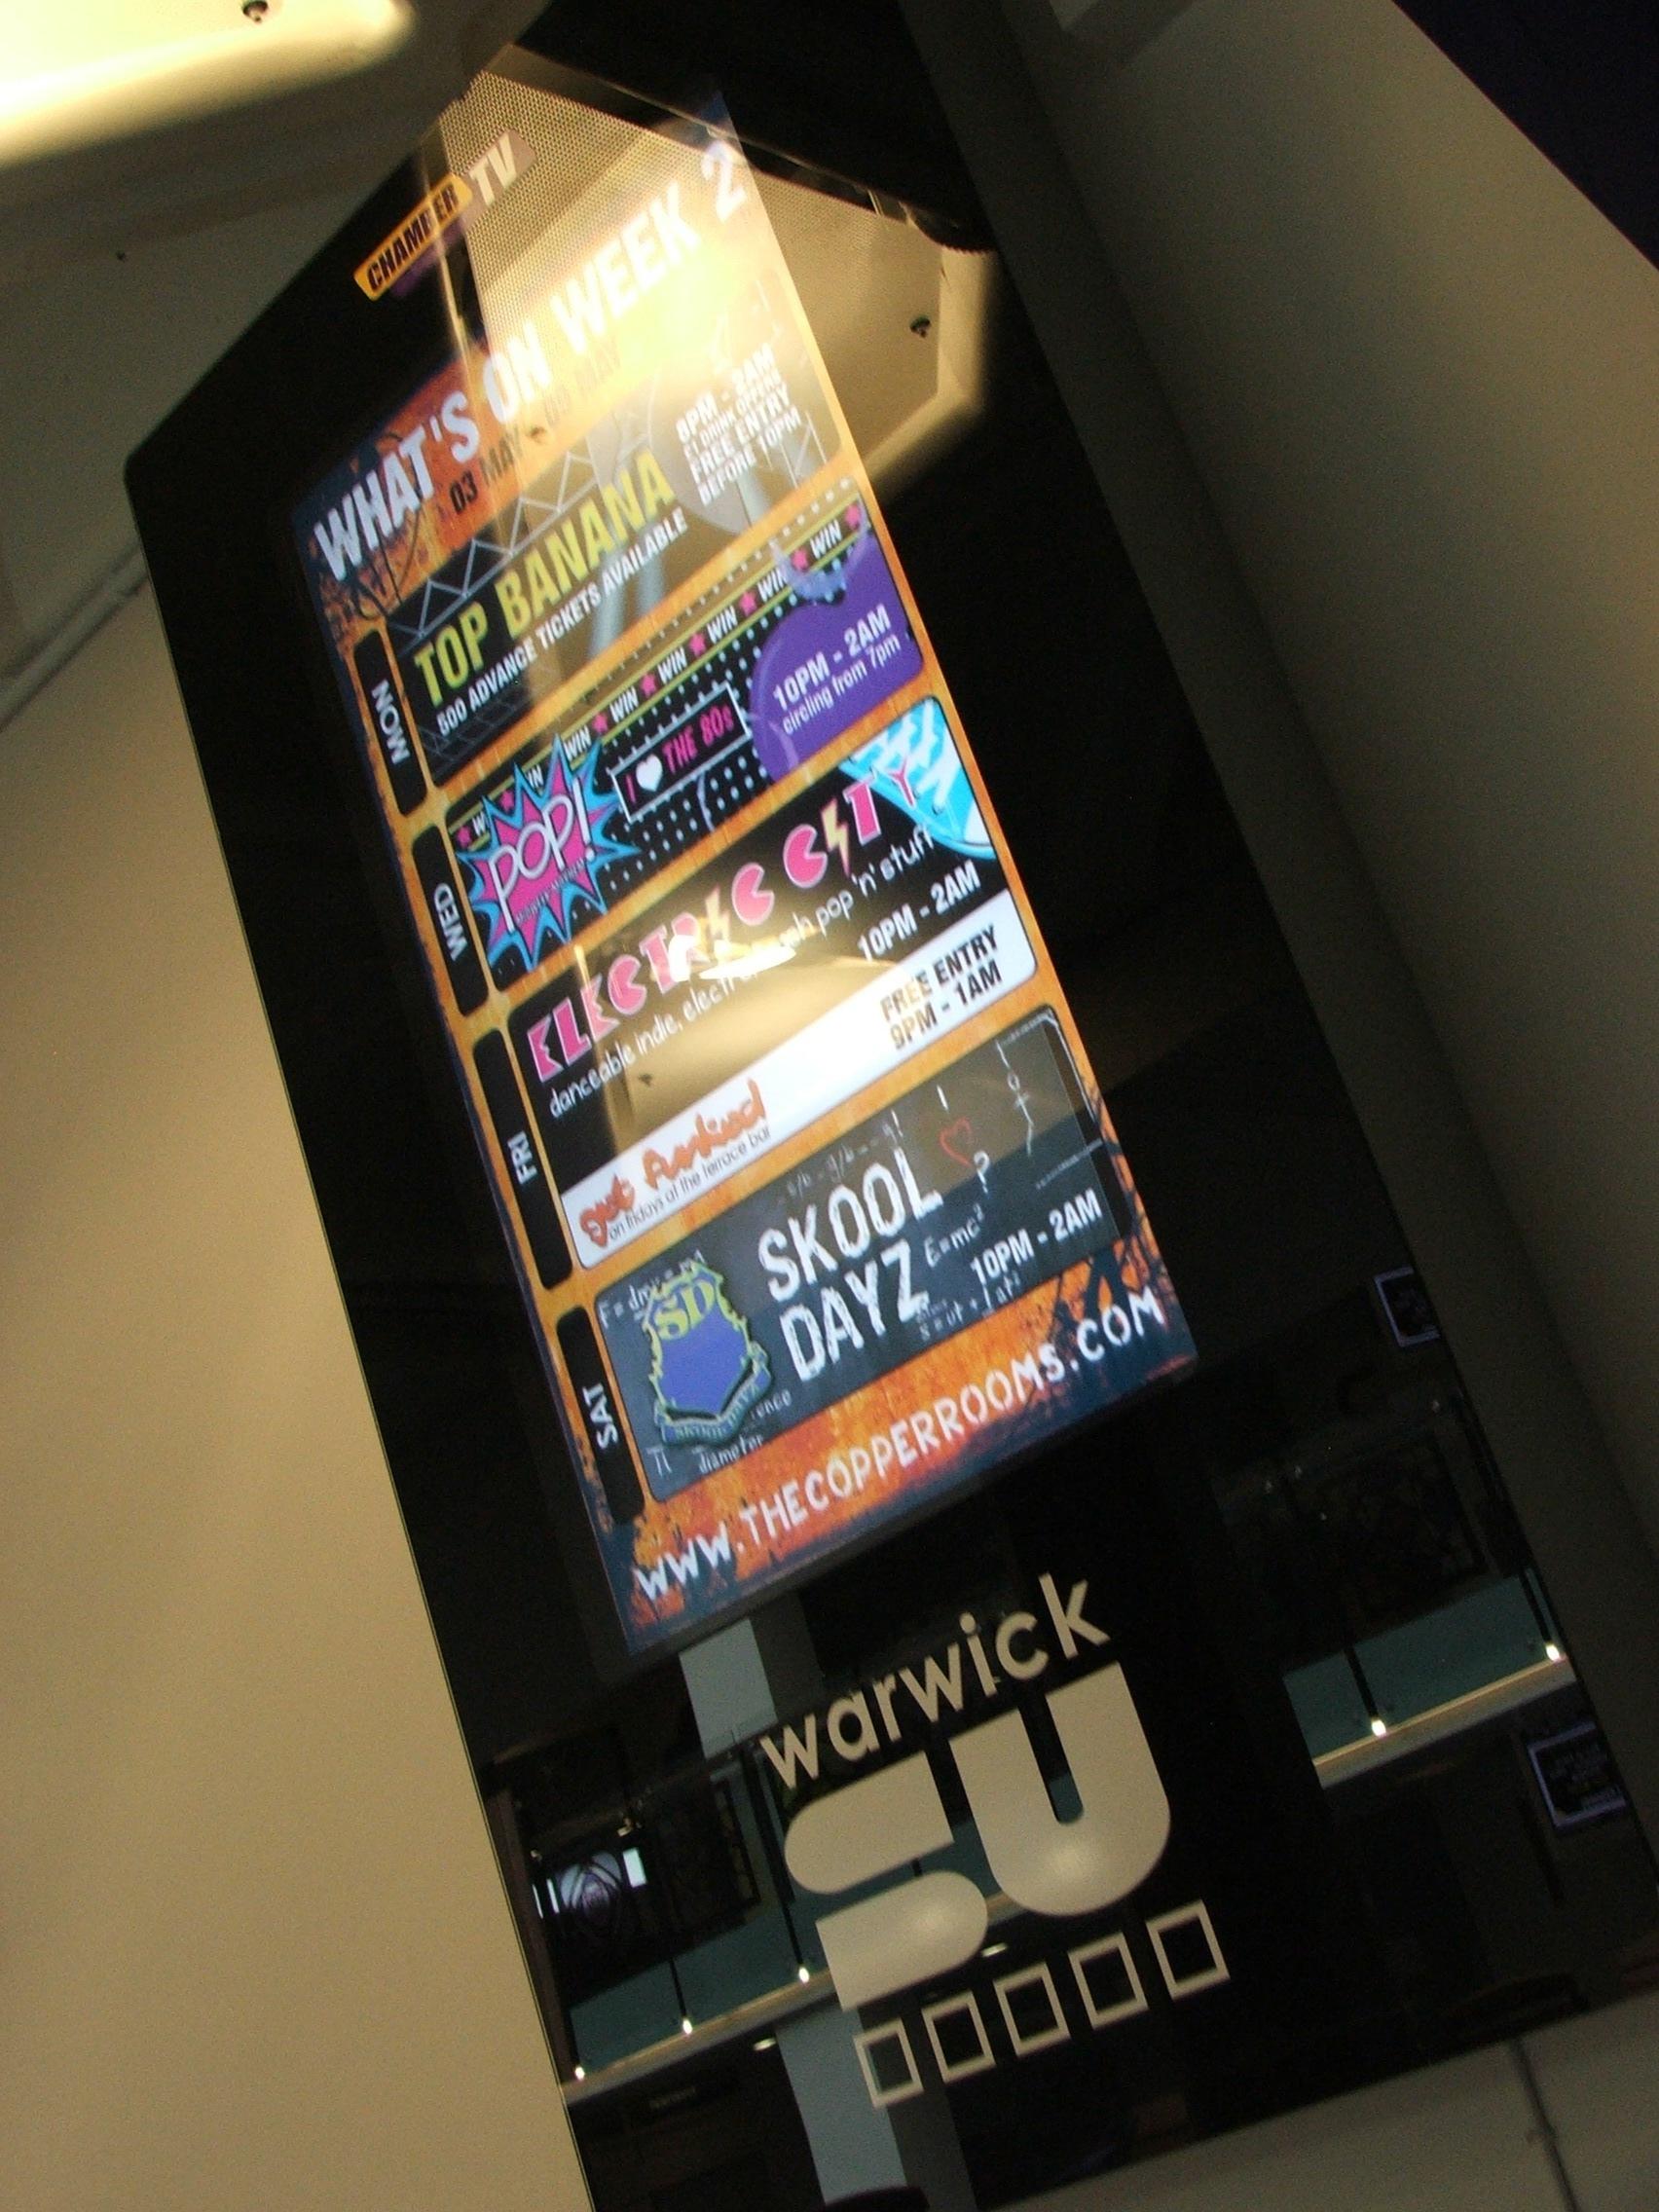 Student's union digital signage